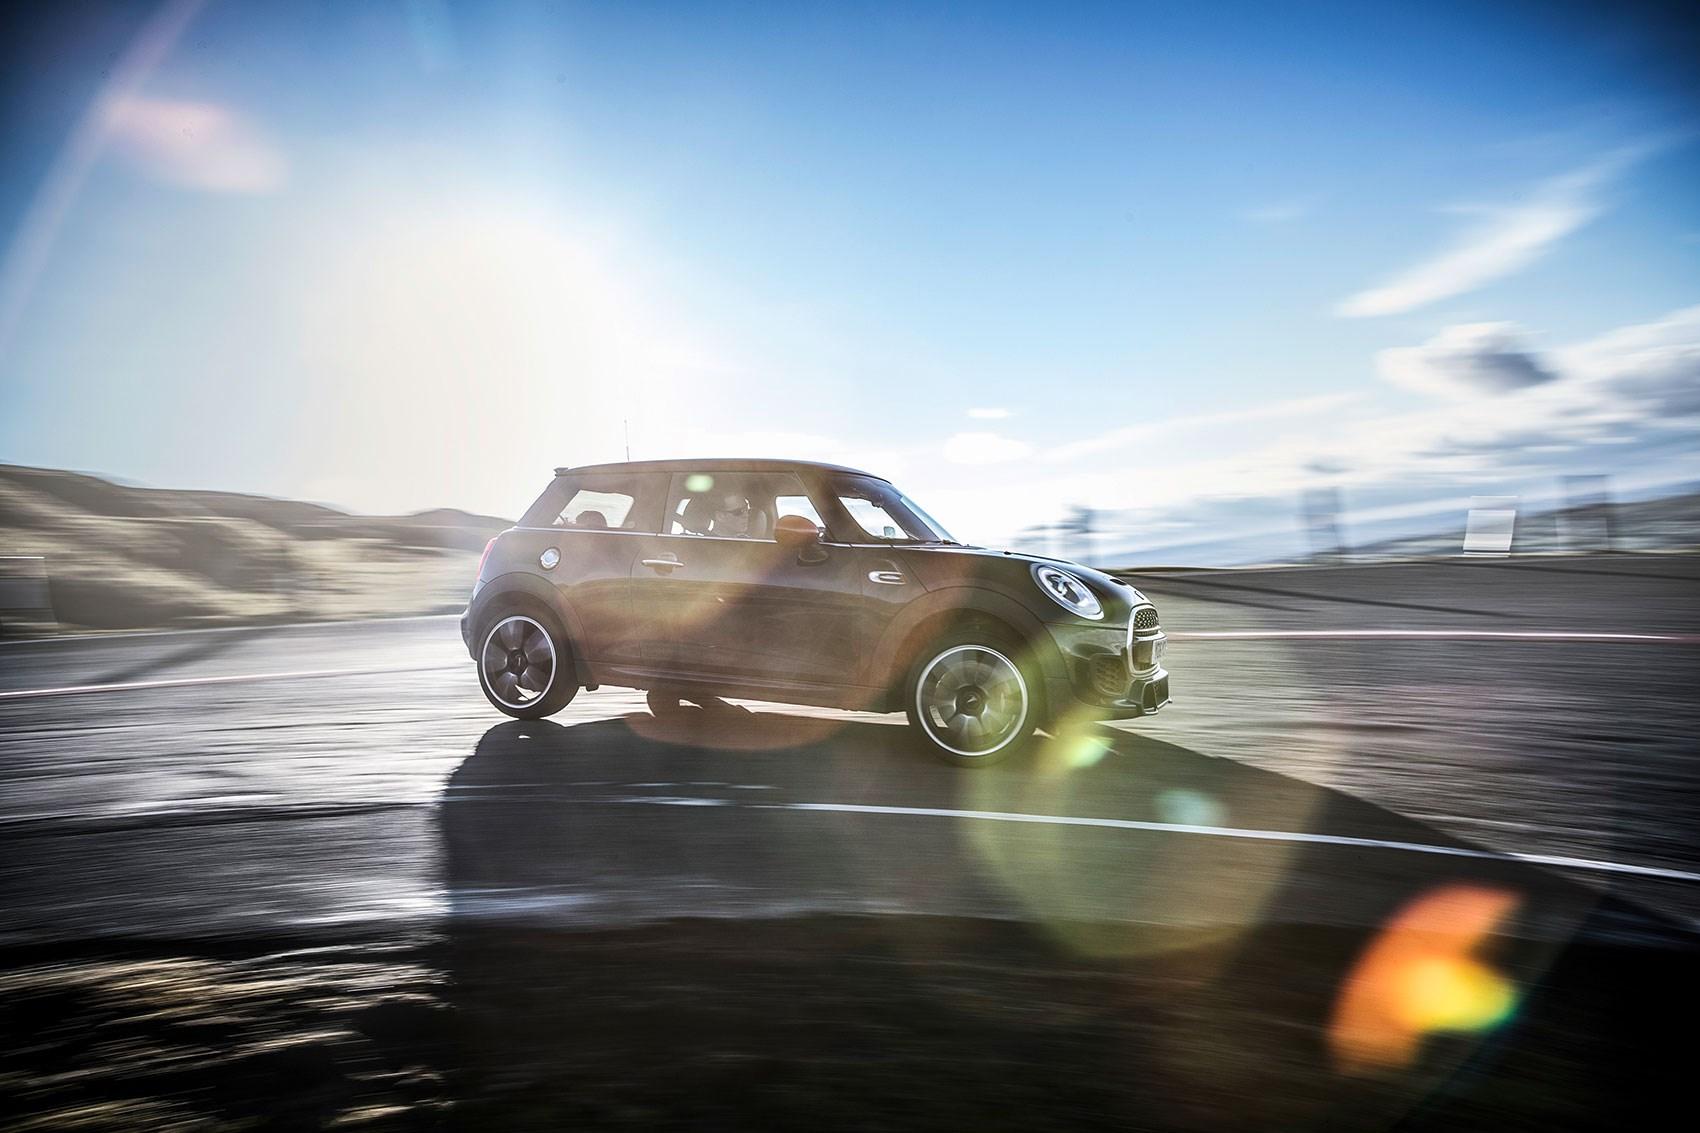 Vw Golf Gti Vs Peugeot 308 Gti Vs Mini Jcw Triple Test Review 2017